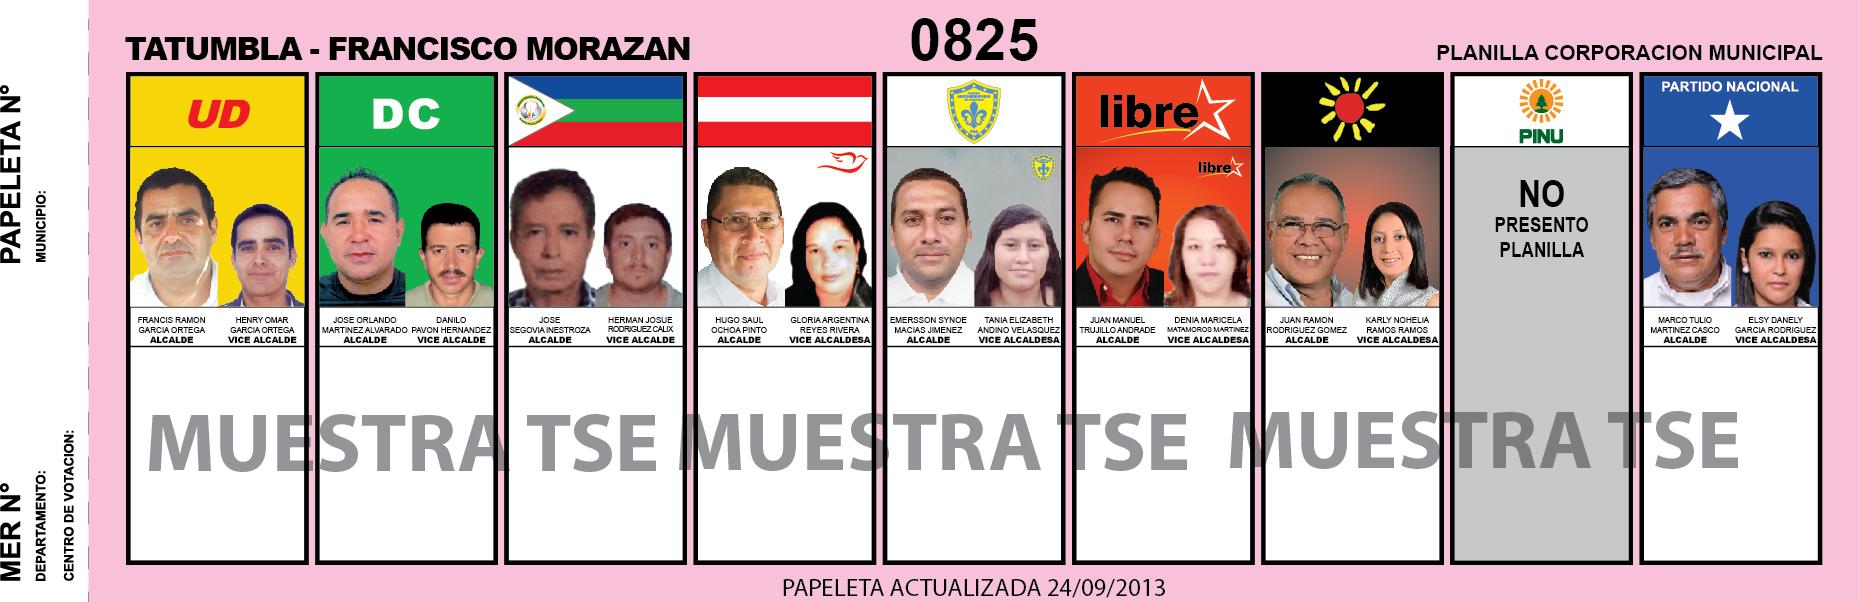 CANDIDATOS 2013 MUNICIPIO TATUMBLA - FRANCISCO MORAZAN - HONDURAS